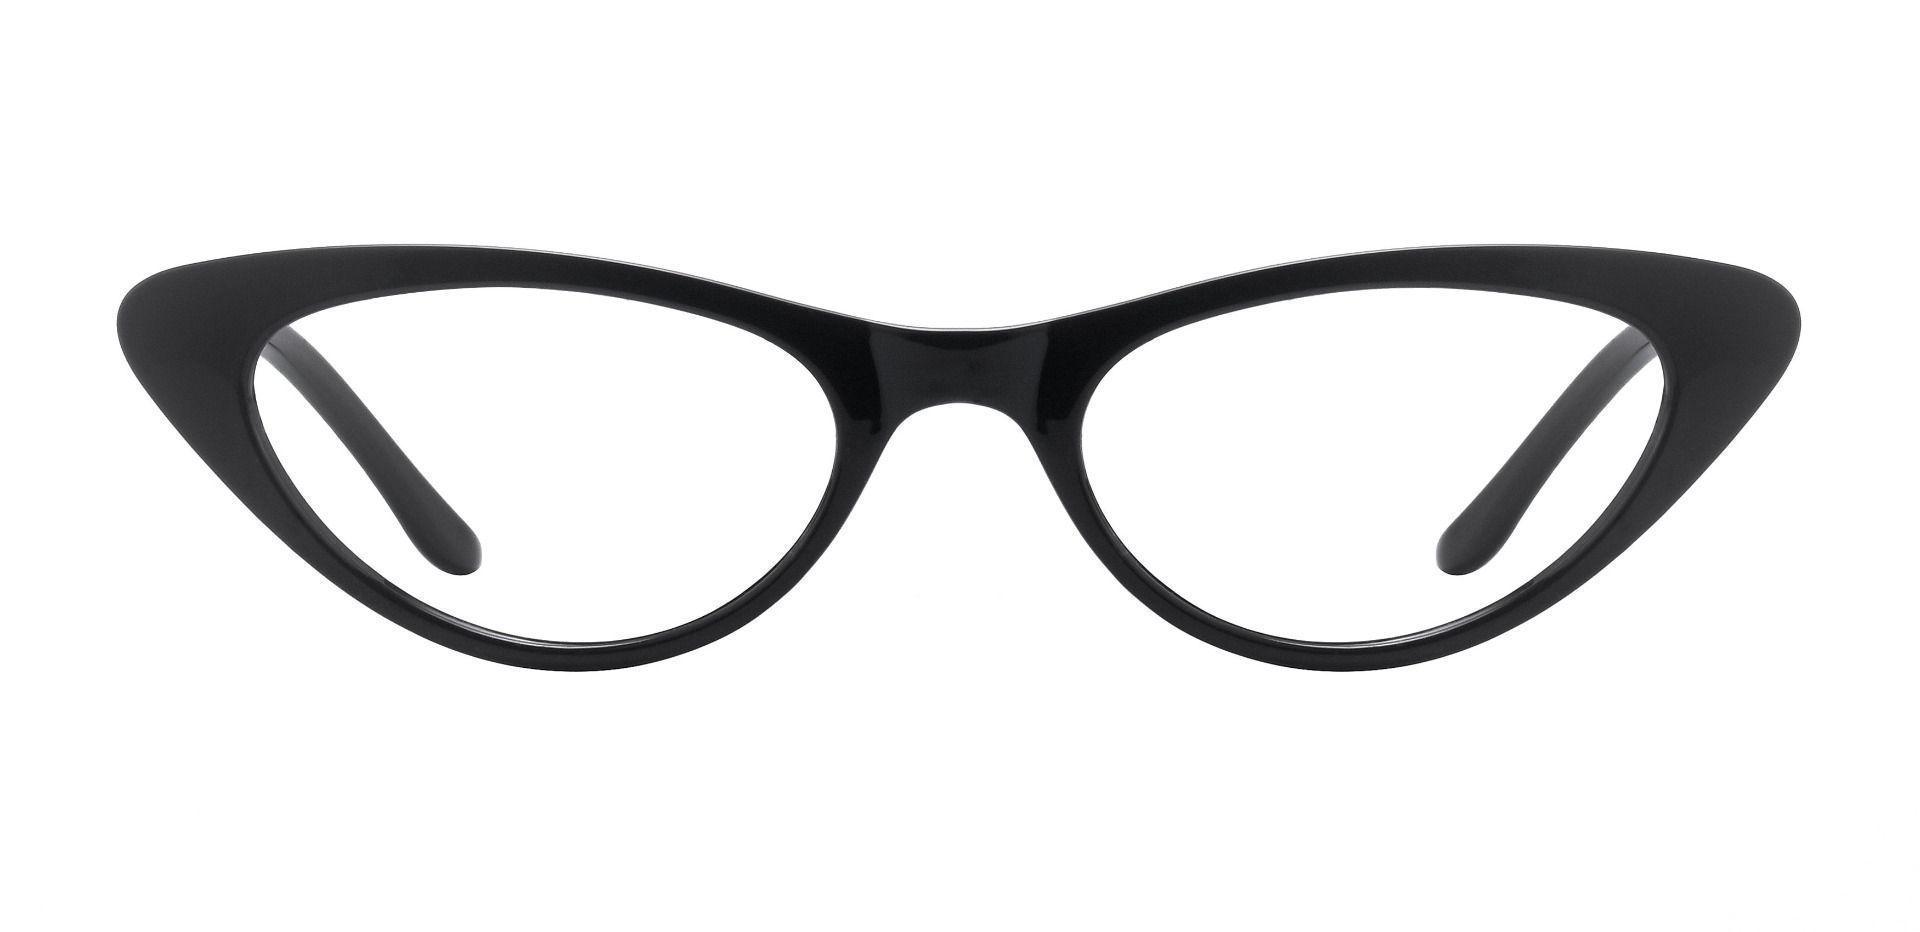 Sassy Cat-Eye Prescription Glasses - Black